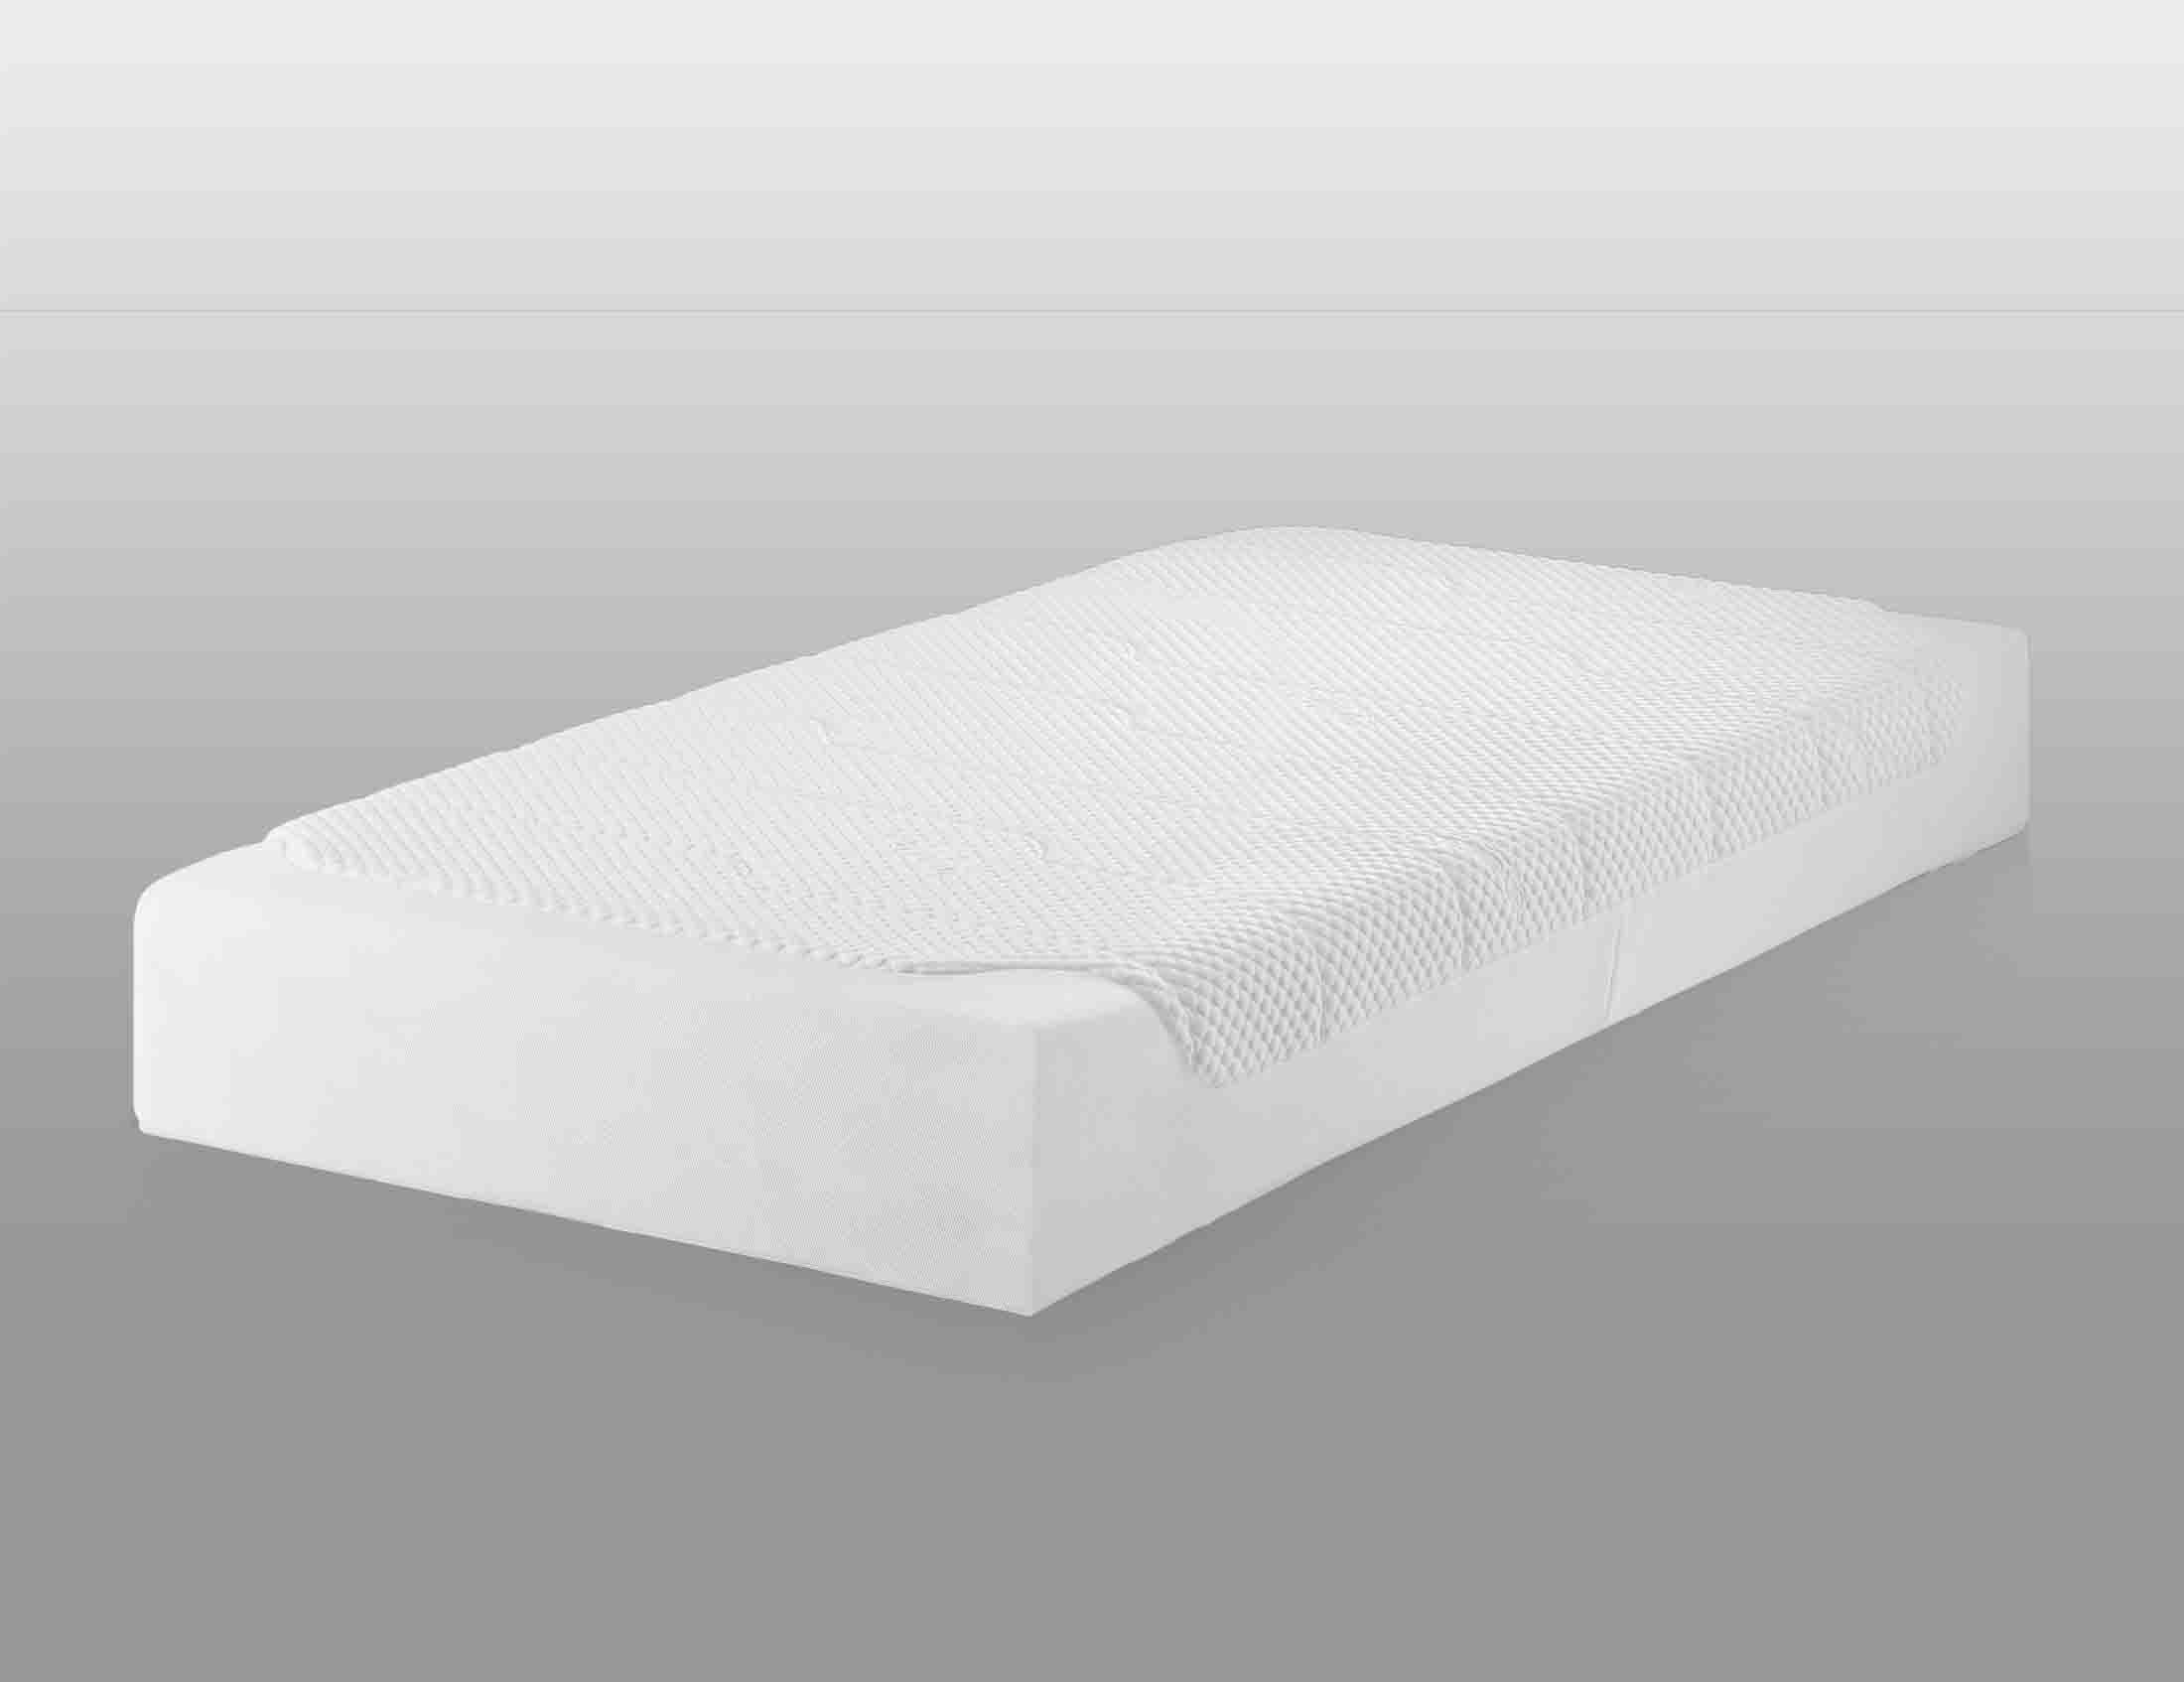 tempur matratze cloud deluxe 22. Black Bedroom Furniture Sets. Home Design Ideas